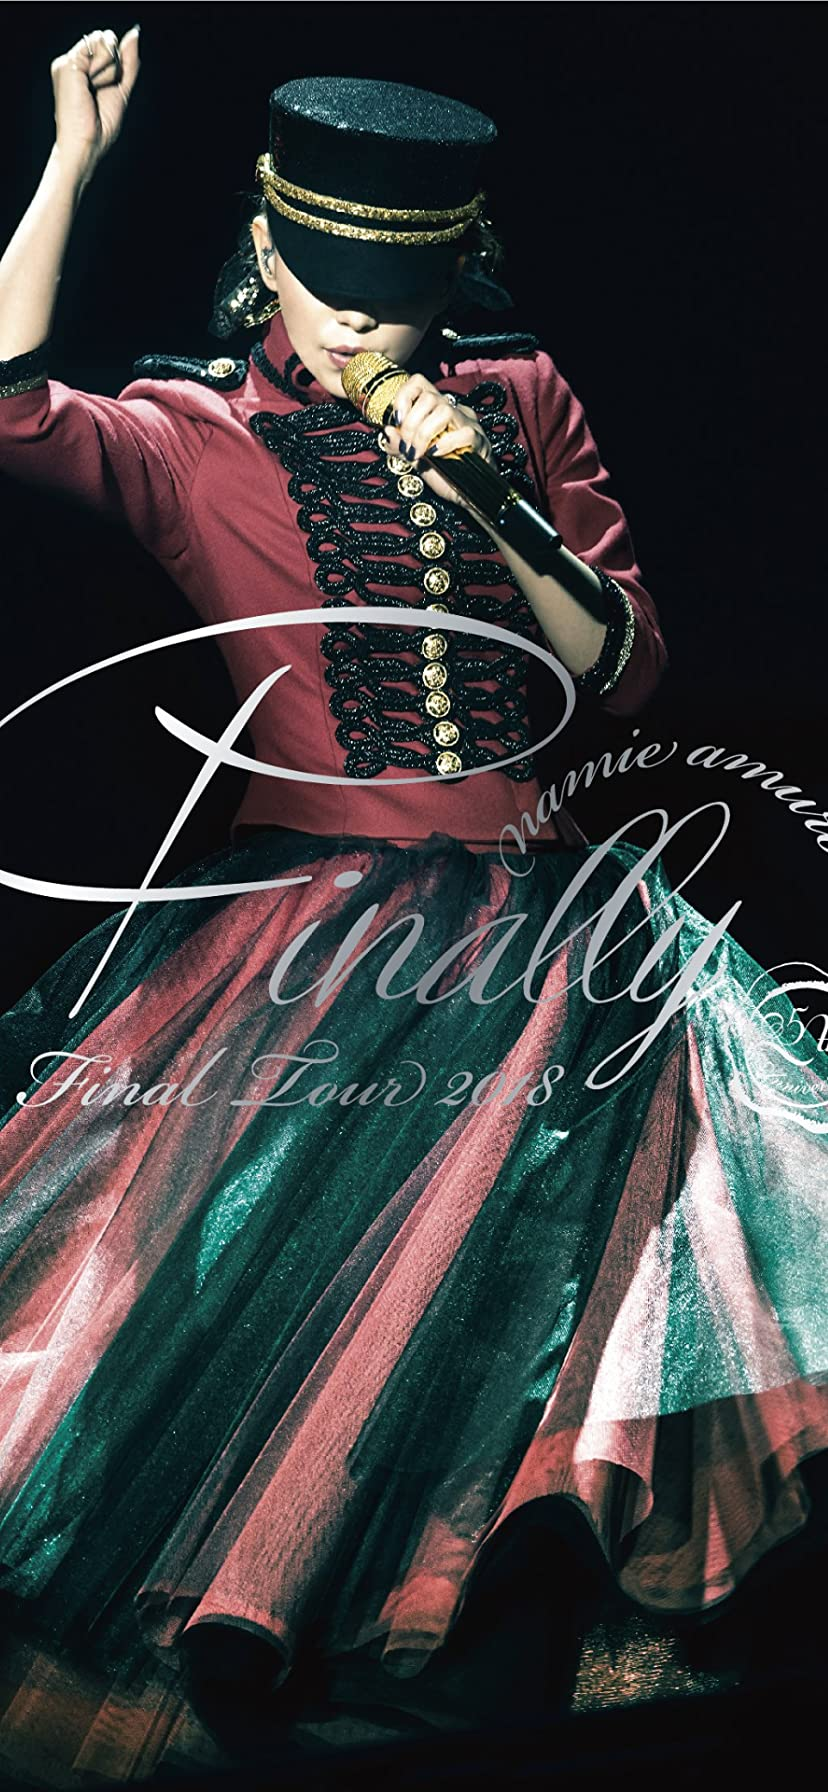 安室奈美恵 Iphone 11 Pro Max Xr Xs Max 壁紙 Namie Amuro Final Tour